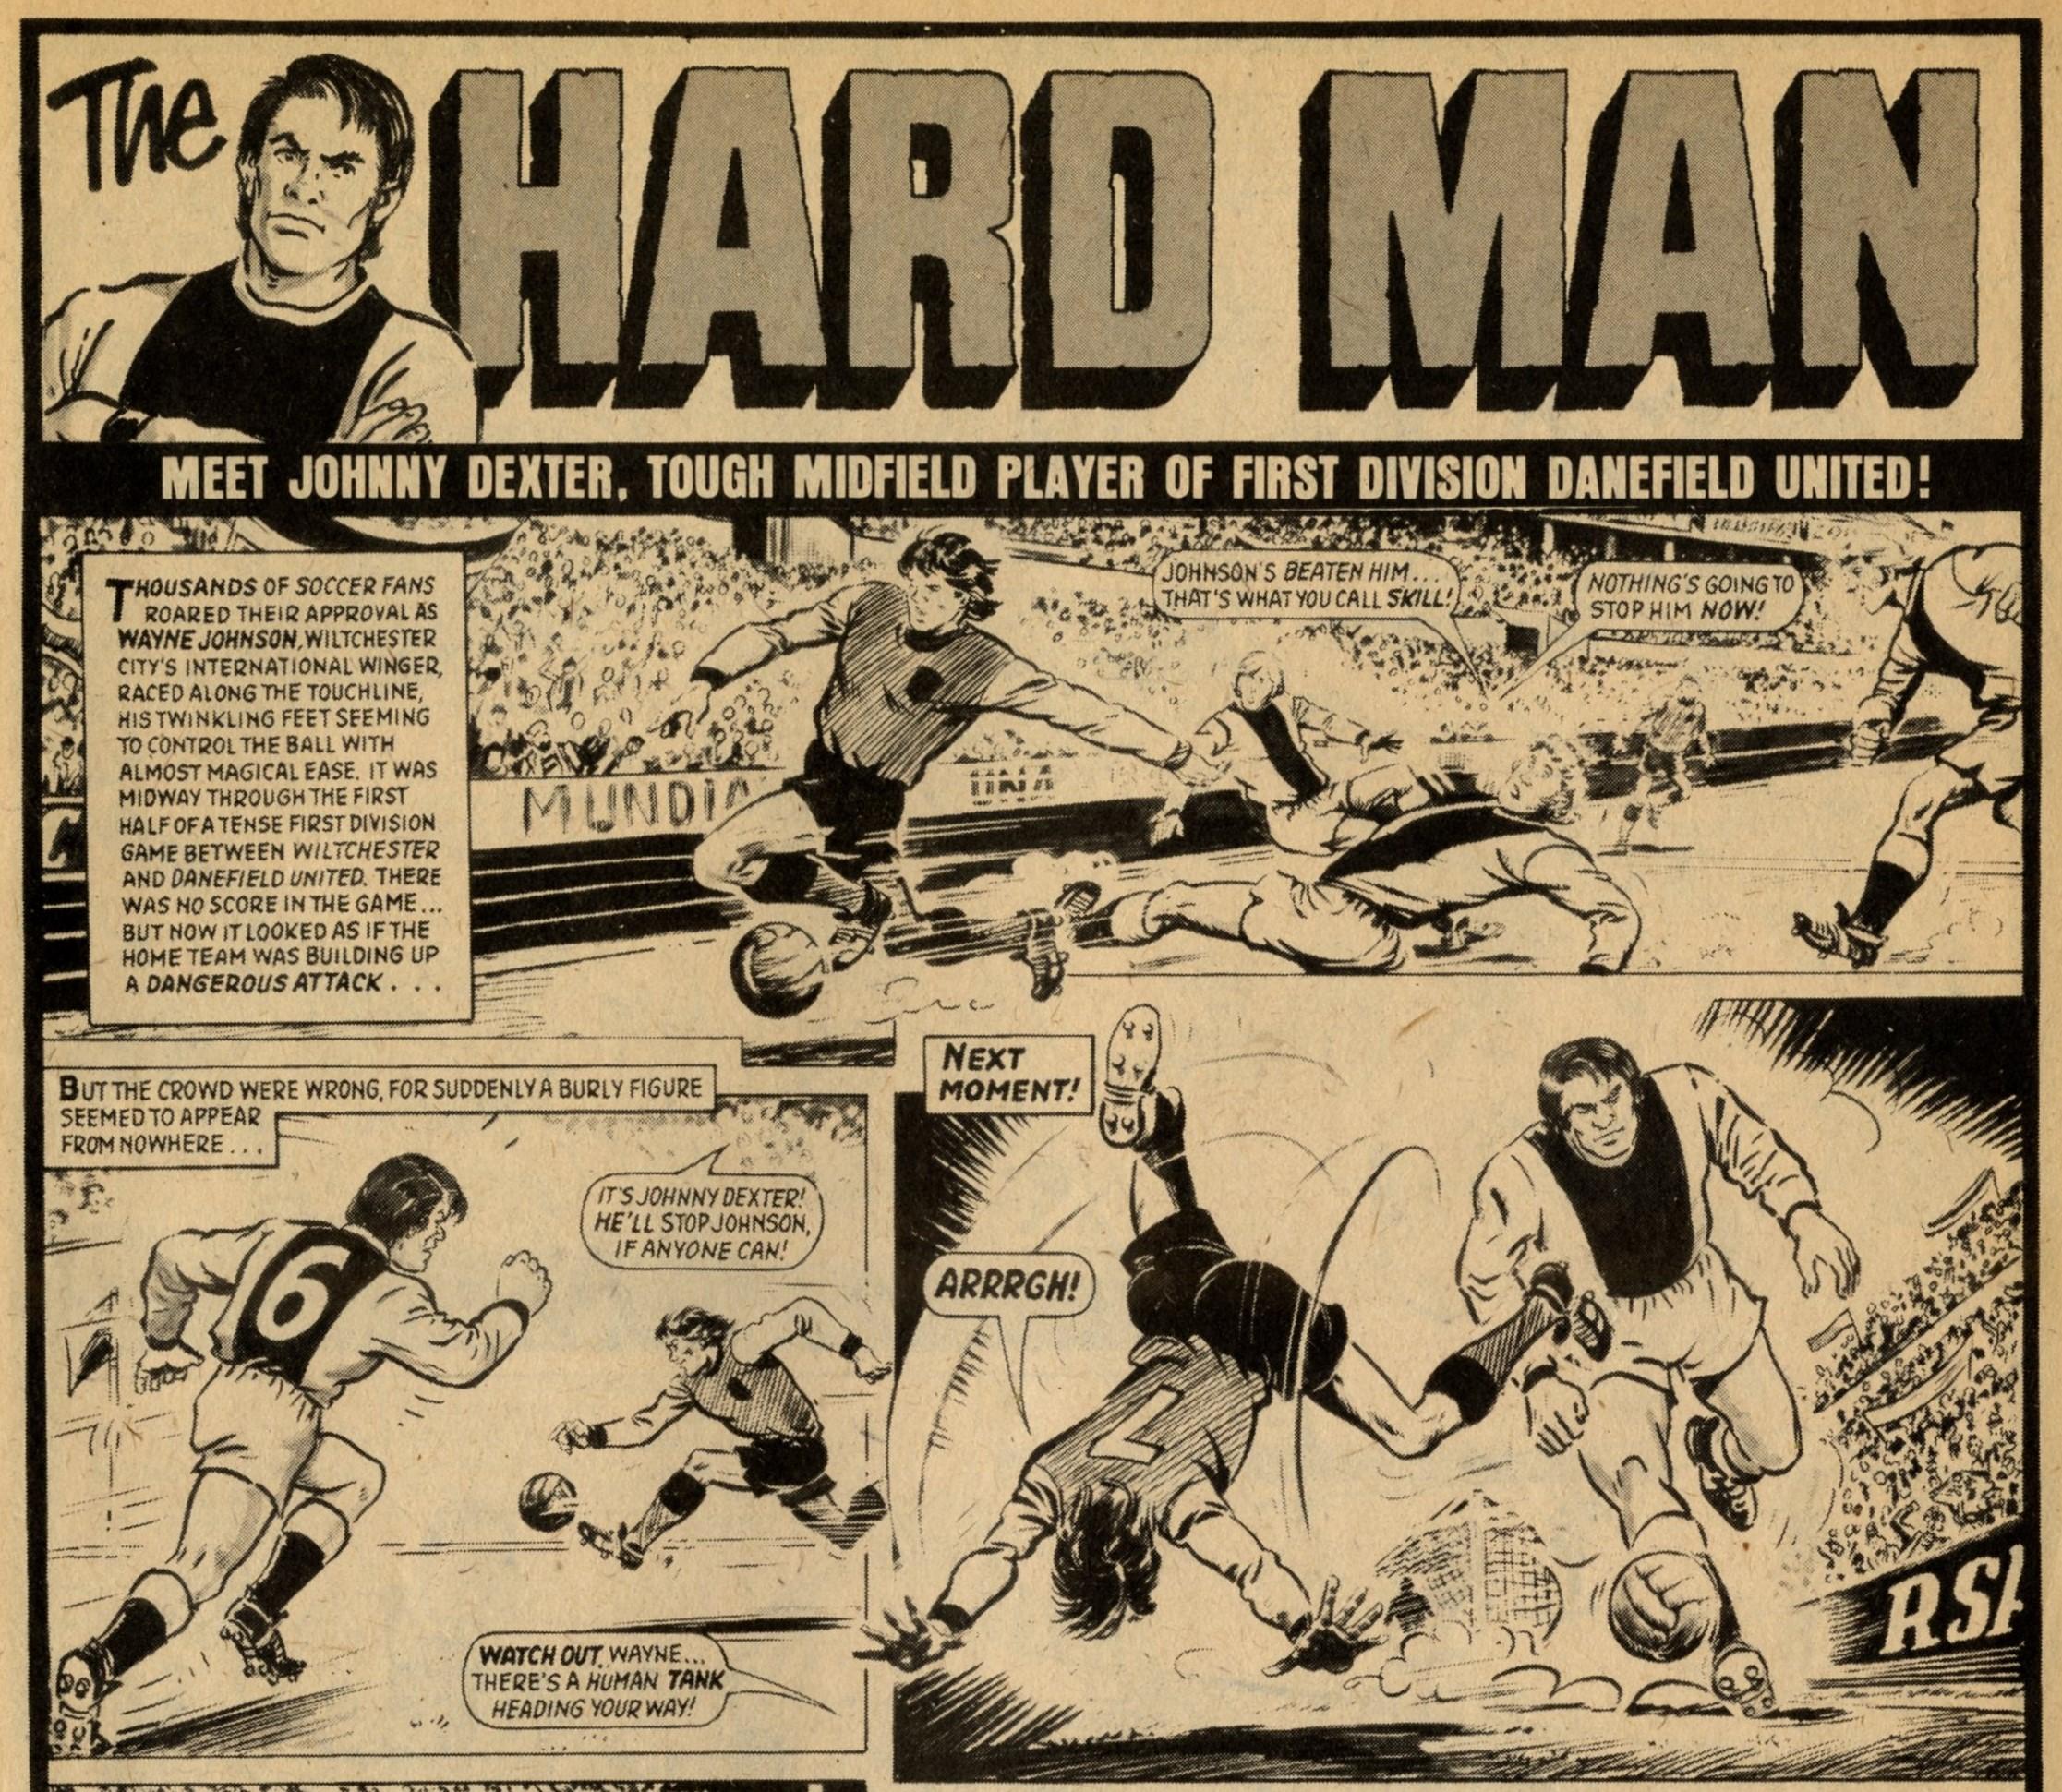 The Hard Man: Barrie Tomlinson (writer), artist uncertain